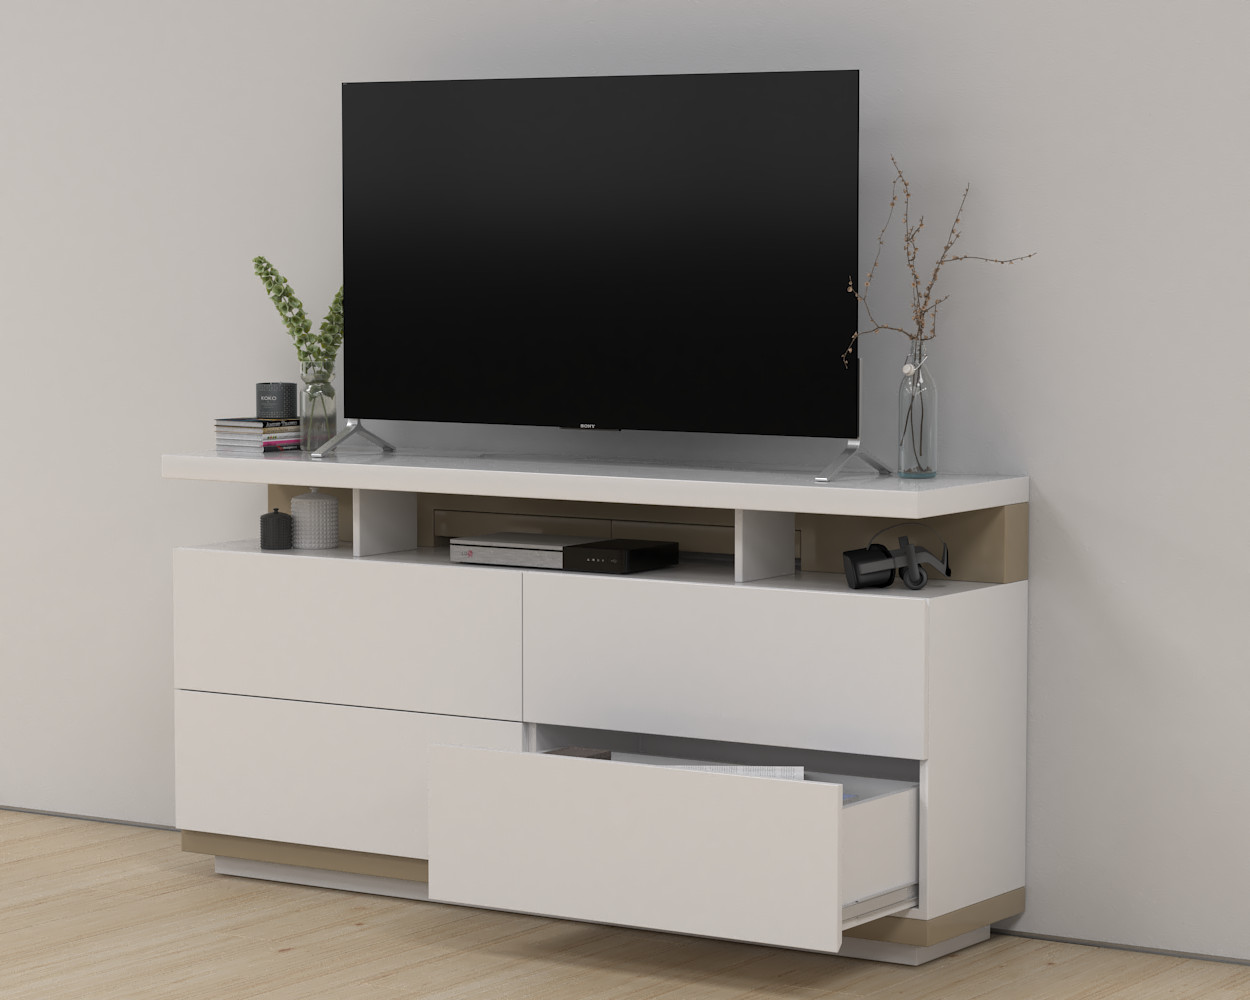 Modulus muebles contempor neos buenos aires home 2 for Muebles comodas modernas